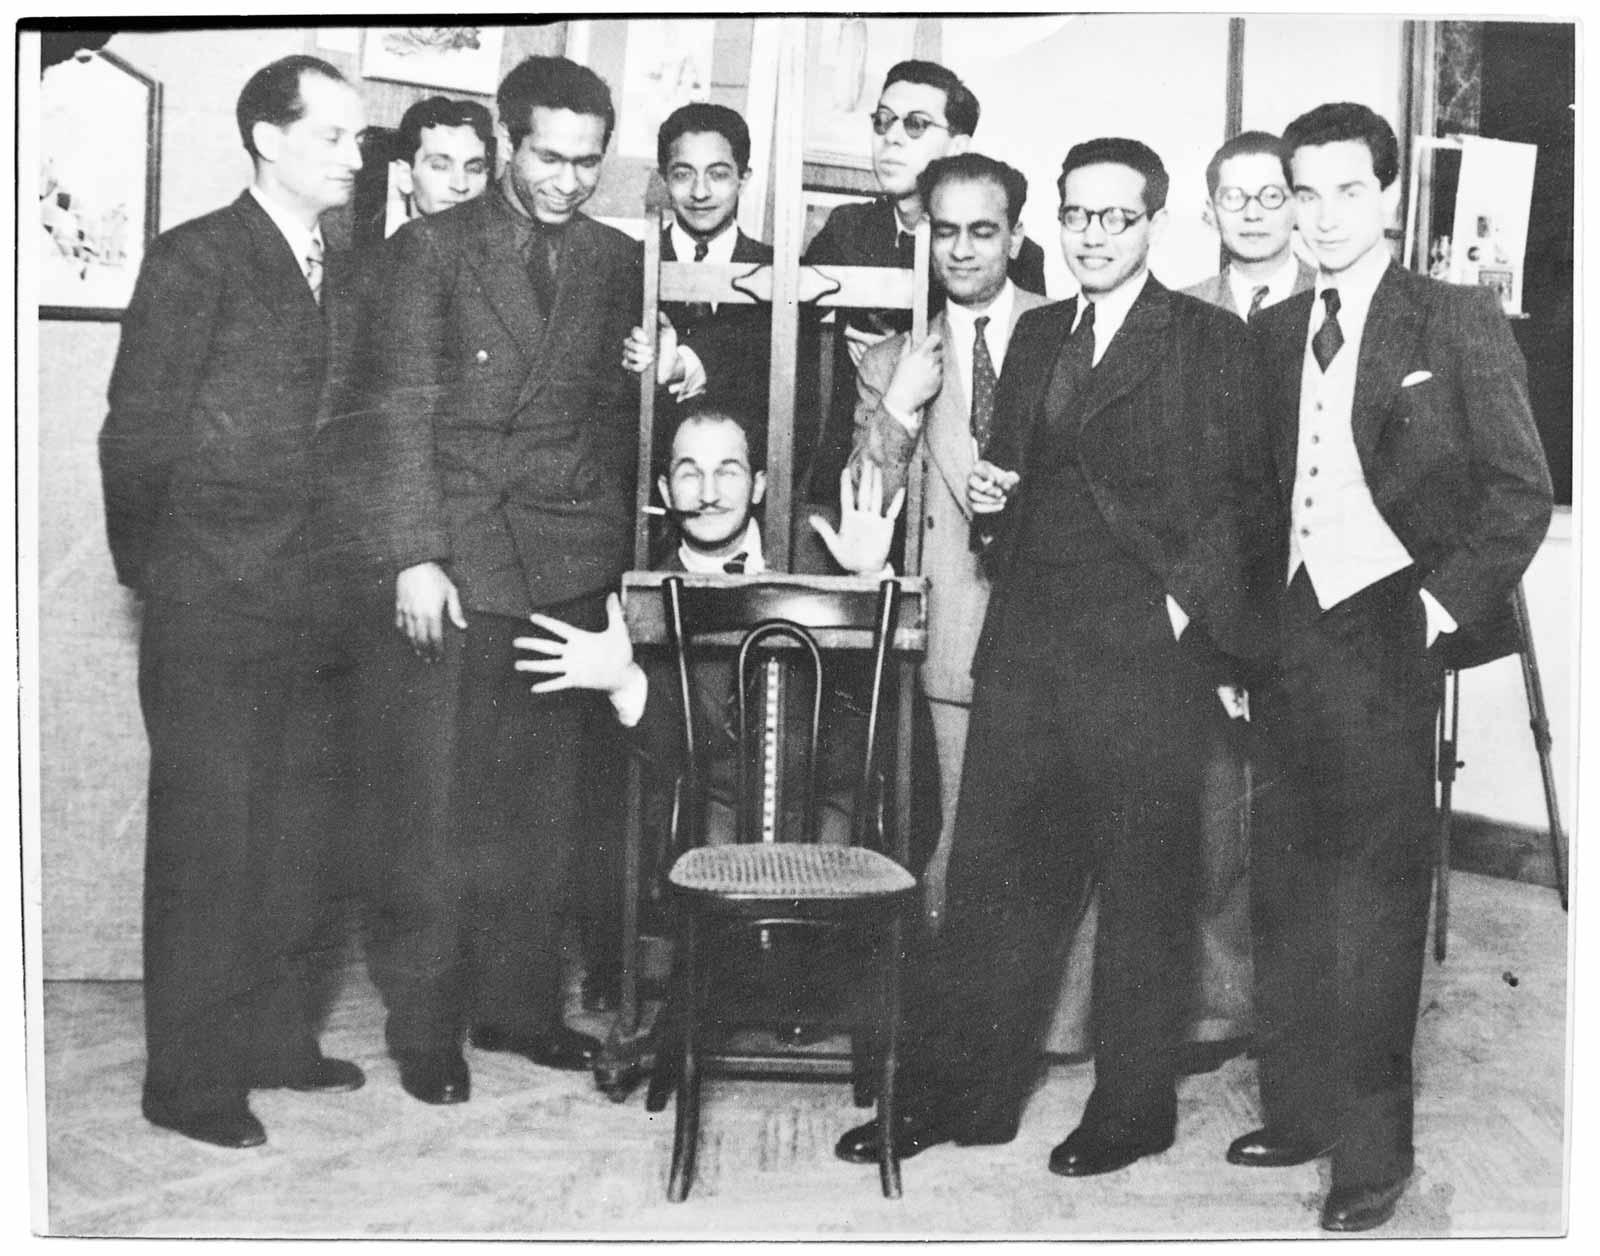 Art et Liberté: Egypt's Surrealists | by Charles Shafaieh | NYR